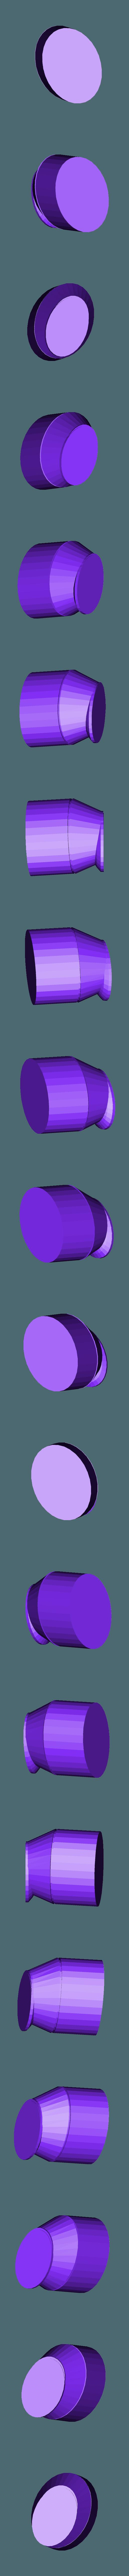 vuzzy_boolean_L_Leg.stl Download free STL file MS-06C Zaku • 3D printing object, nickhaines7